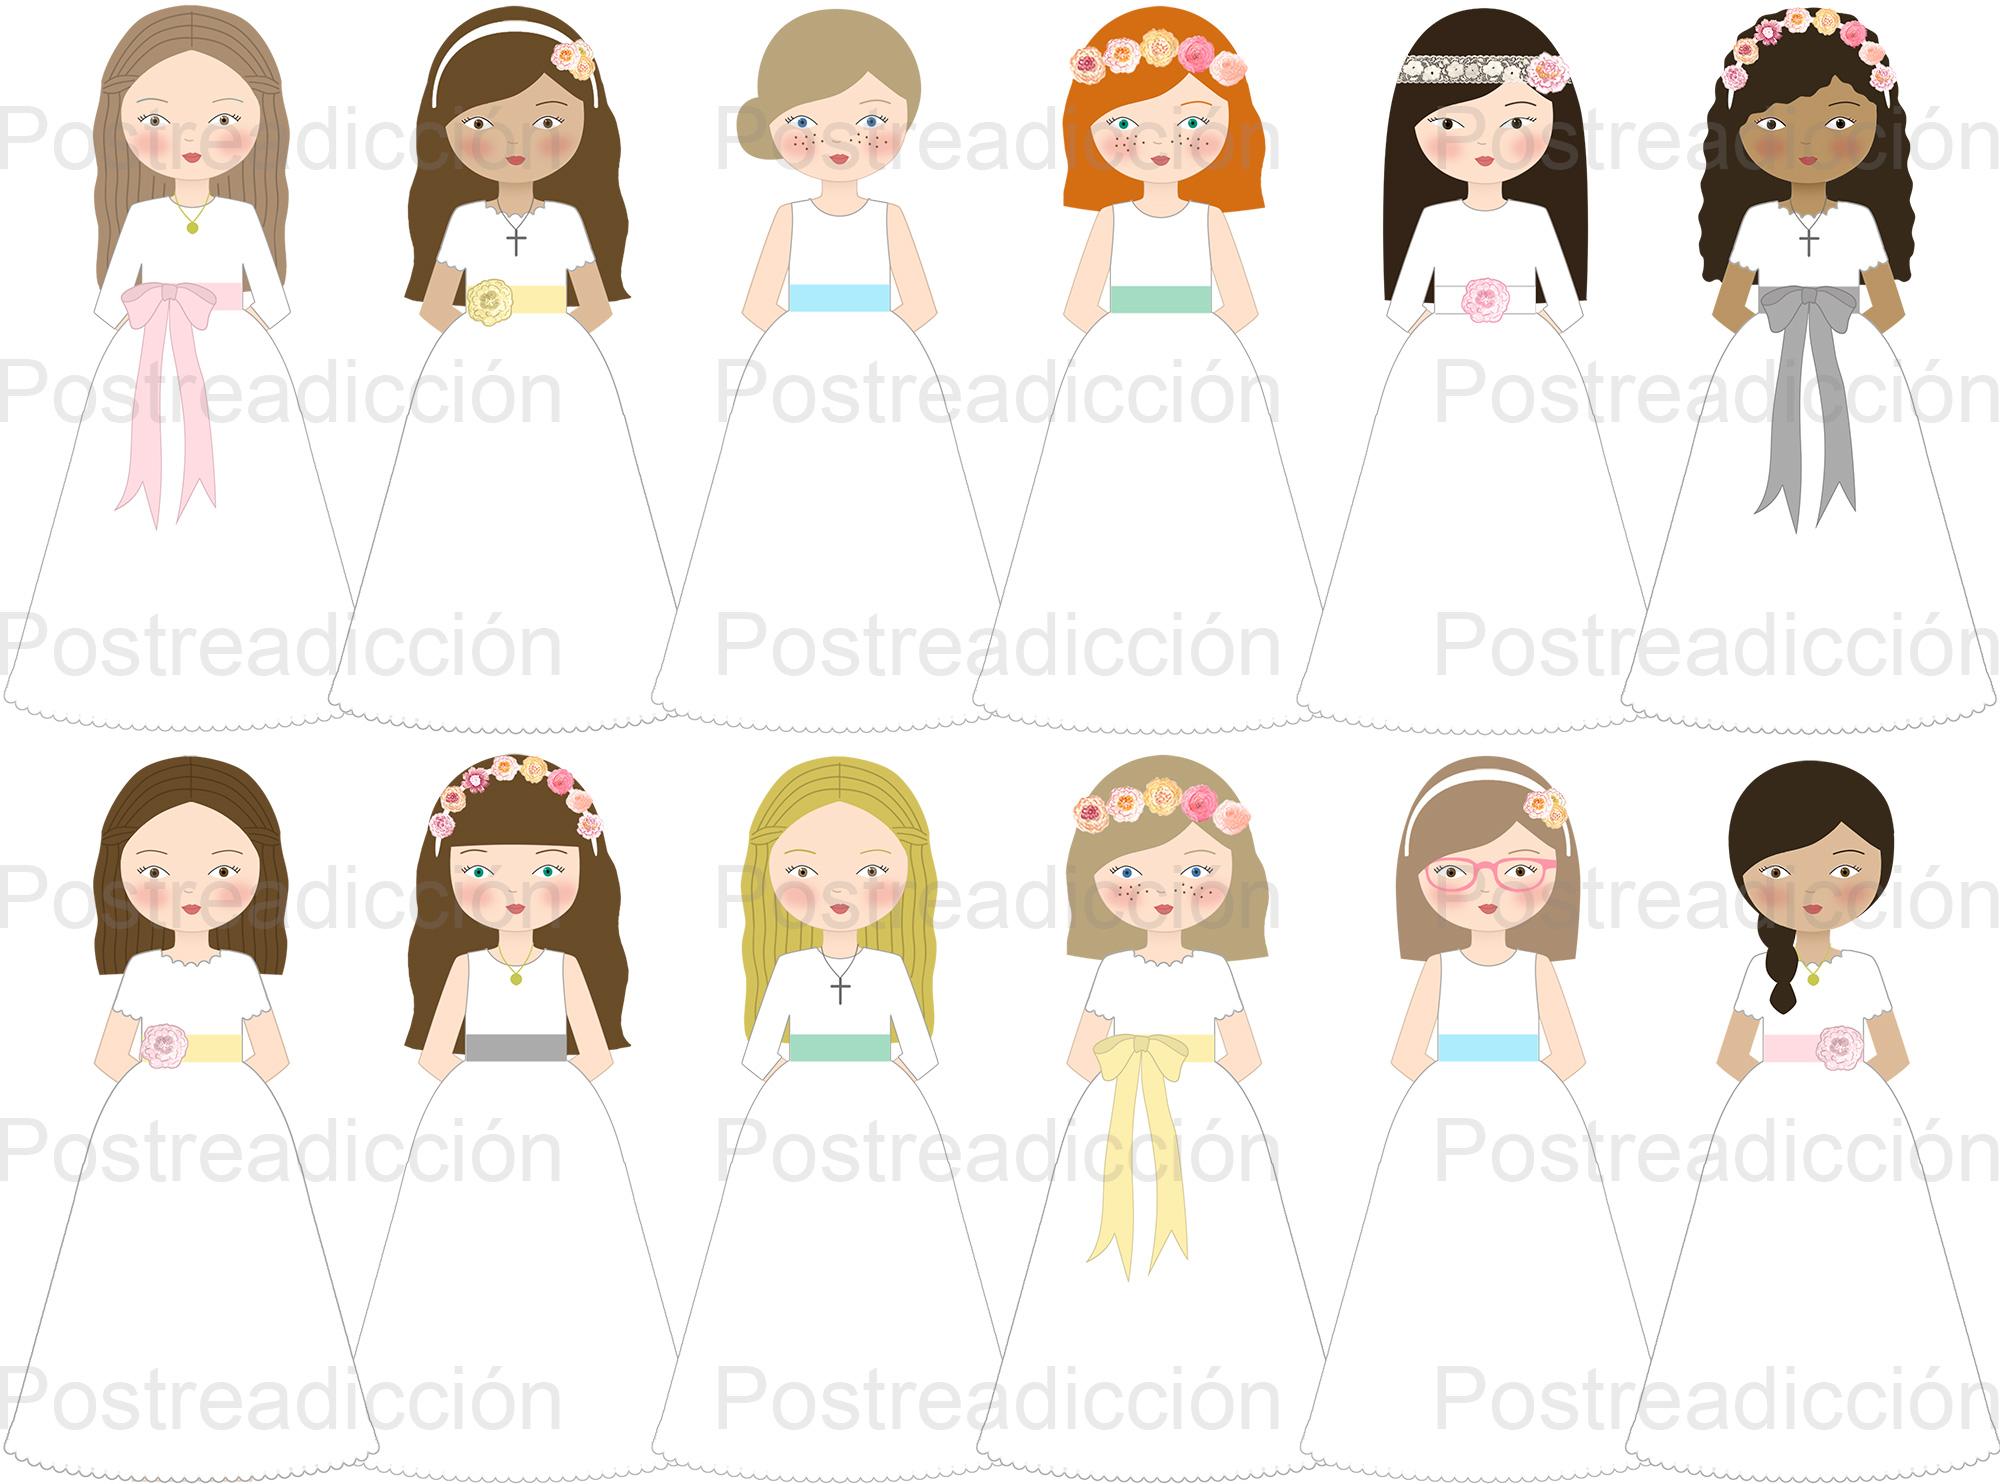 Imagen de producto: https://tienda.postreadiccion.com/img/articulos/secundarias10471-24-etiquetas-de-comunion-de-nina-de-comunion-carlota-3.jpg